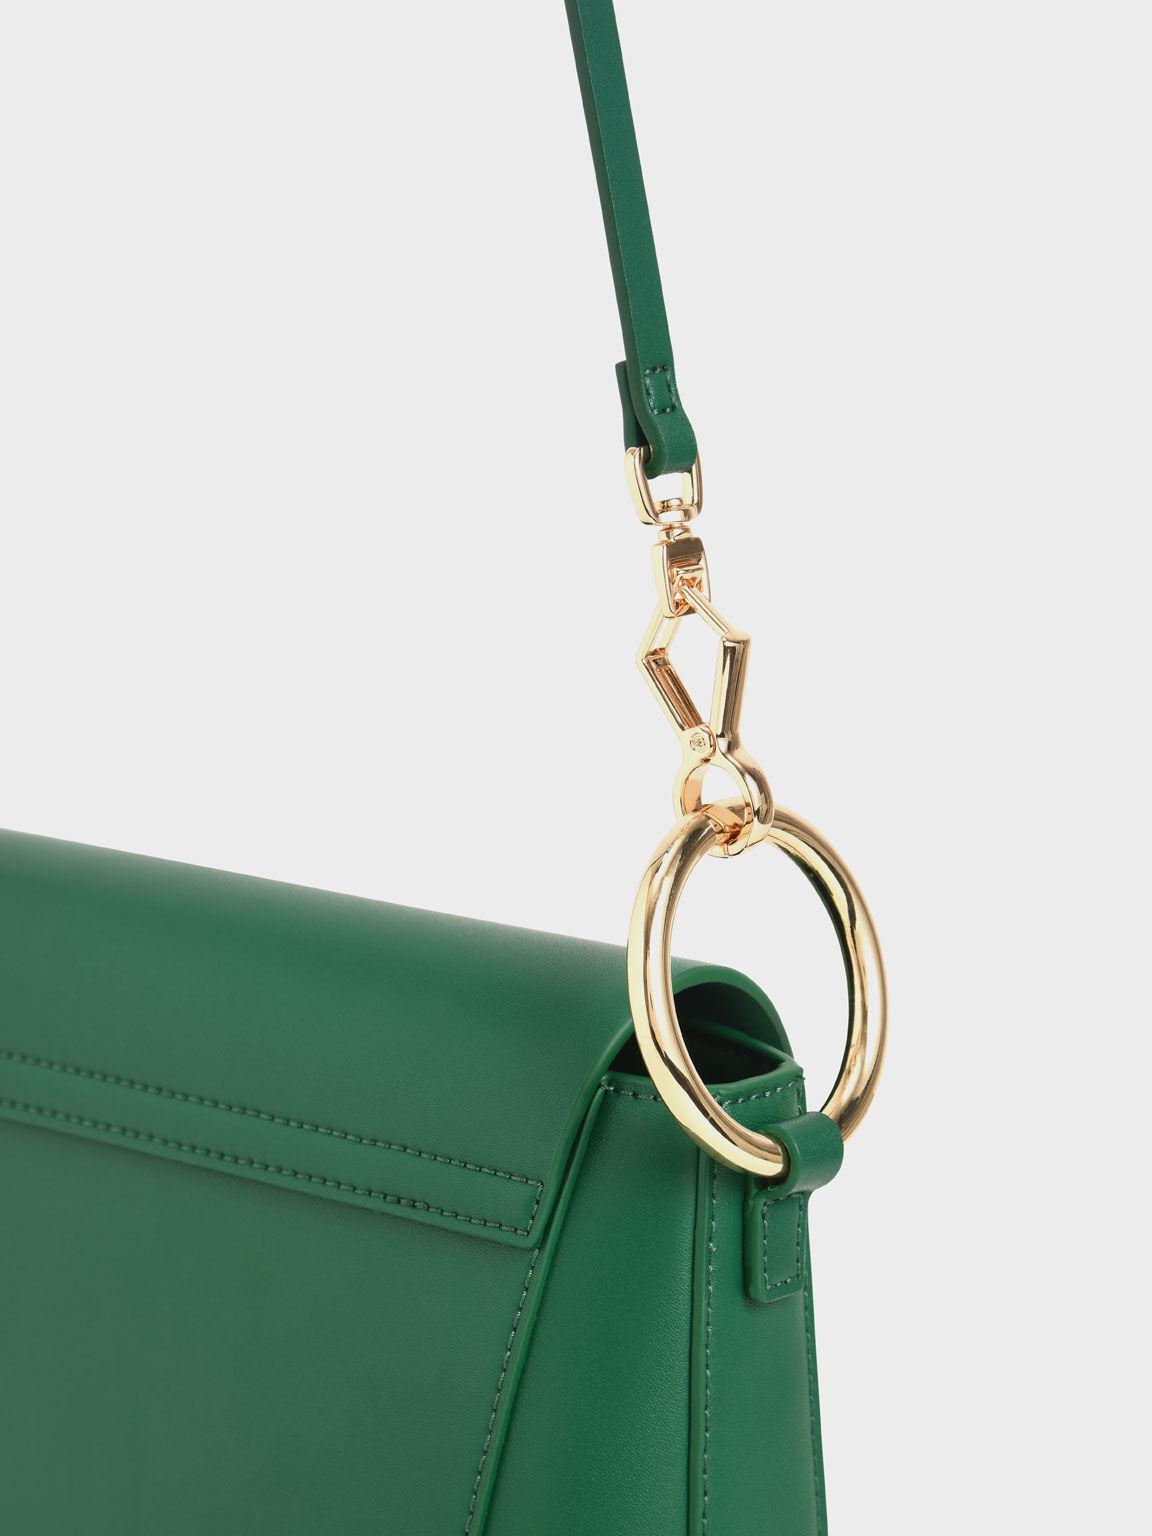 Ring Detail Crossbody Bag, Green, hi-res